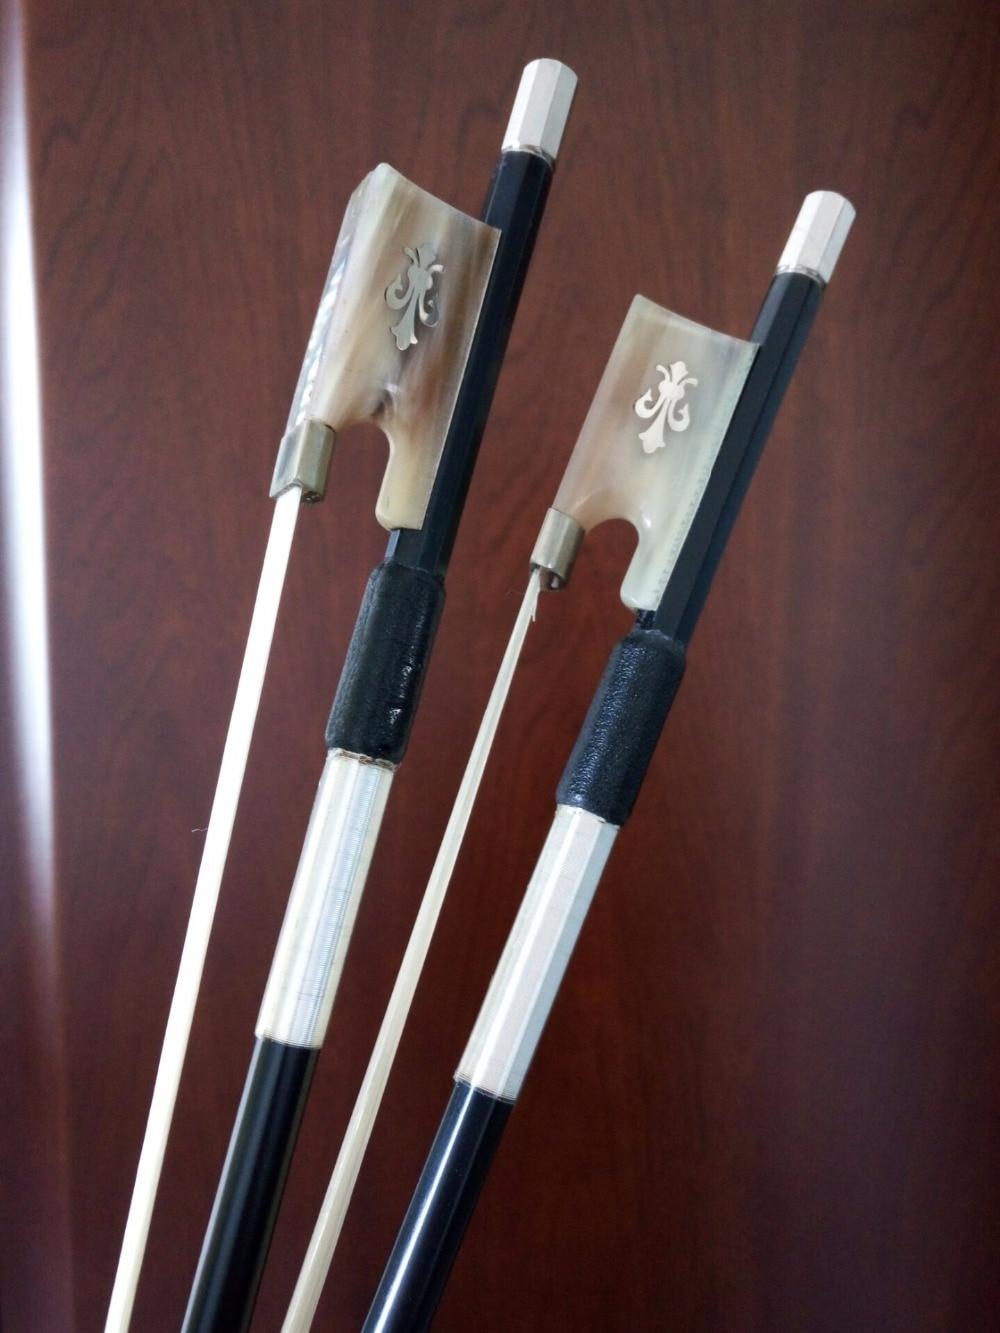 1pc NEW 4/4 Carbon Fiber Violin Bow Pernambuco Performance Straight